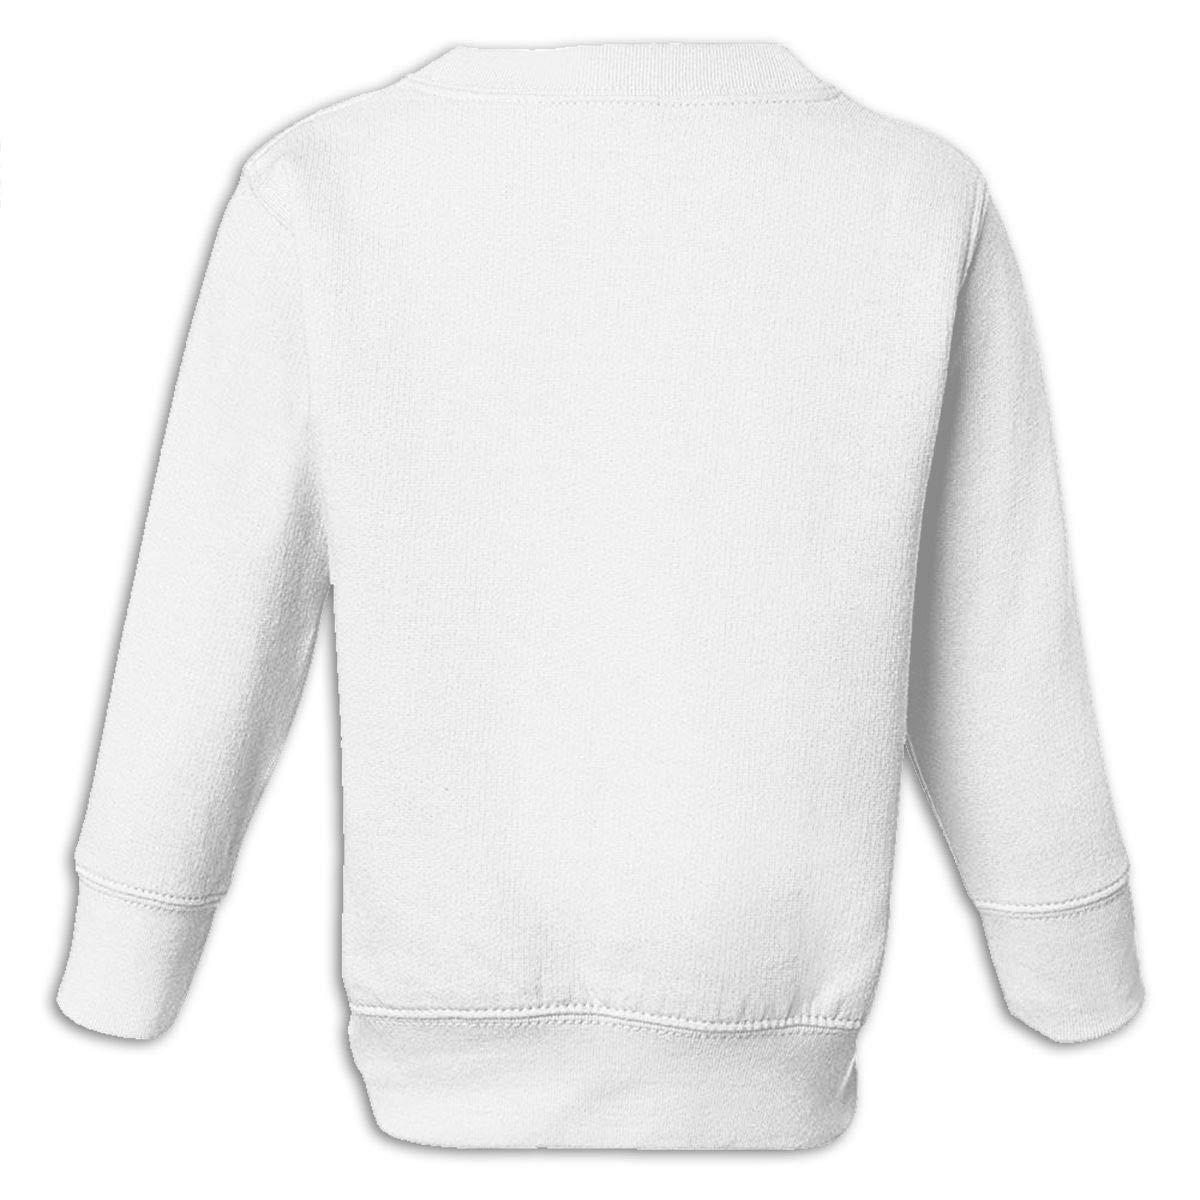 NMDJC CCQ Best Nephew Ever Baby Sweatshirt Fashion Juvenile Hoodies Soft Sweaters